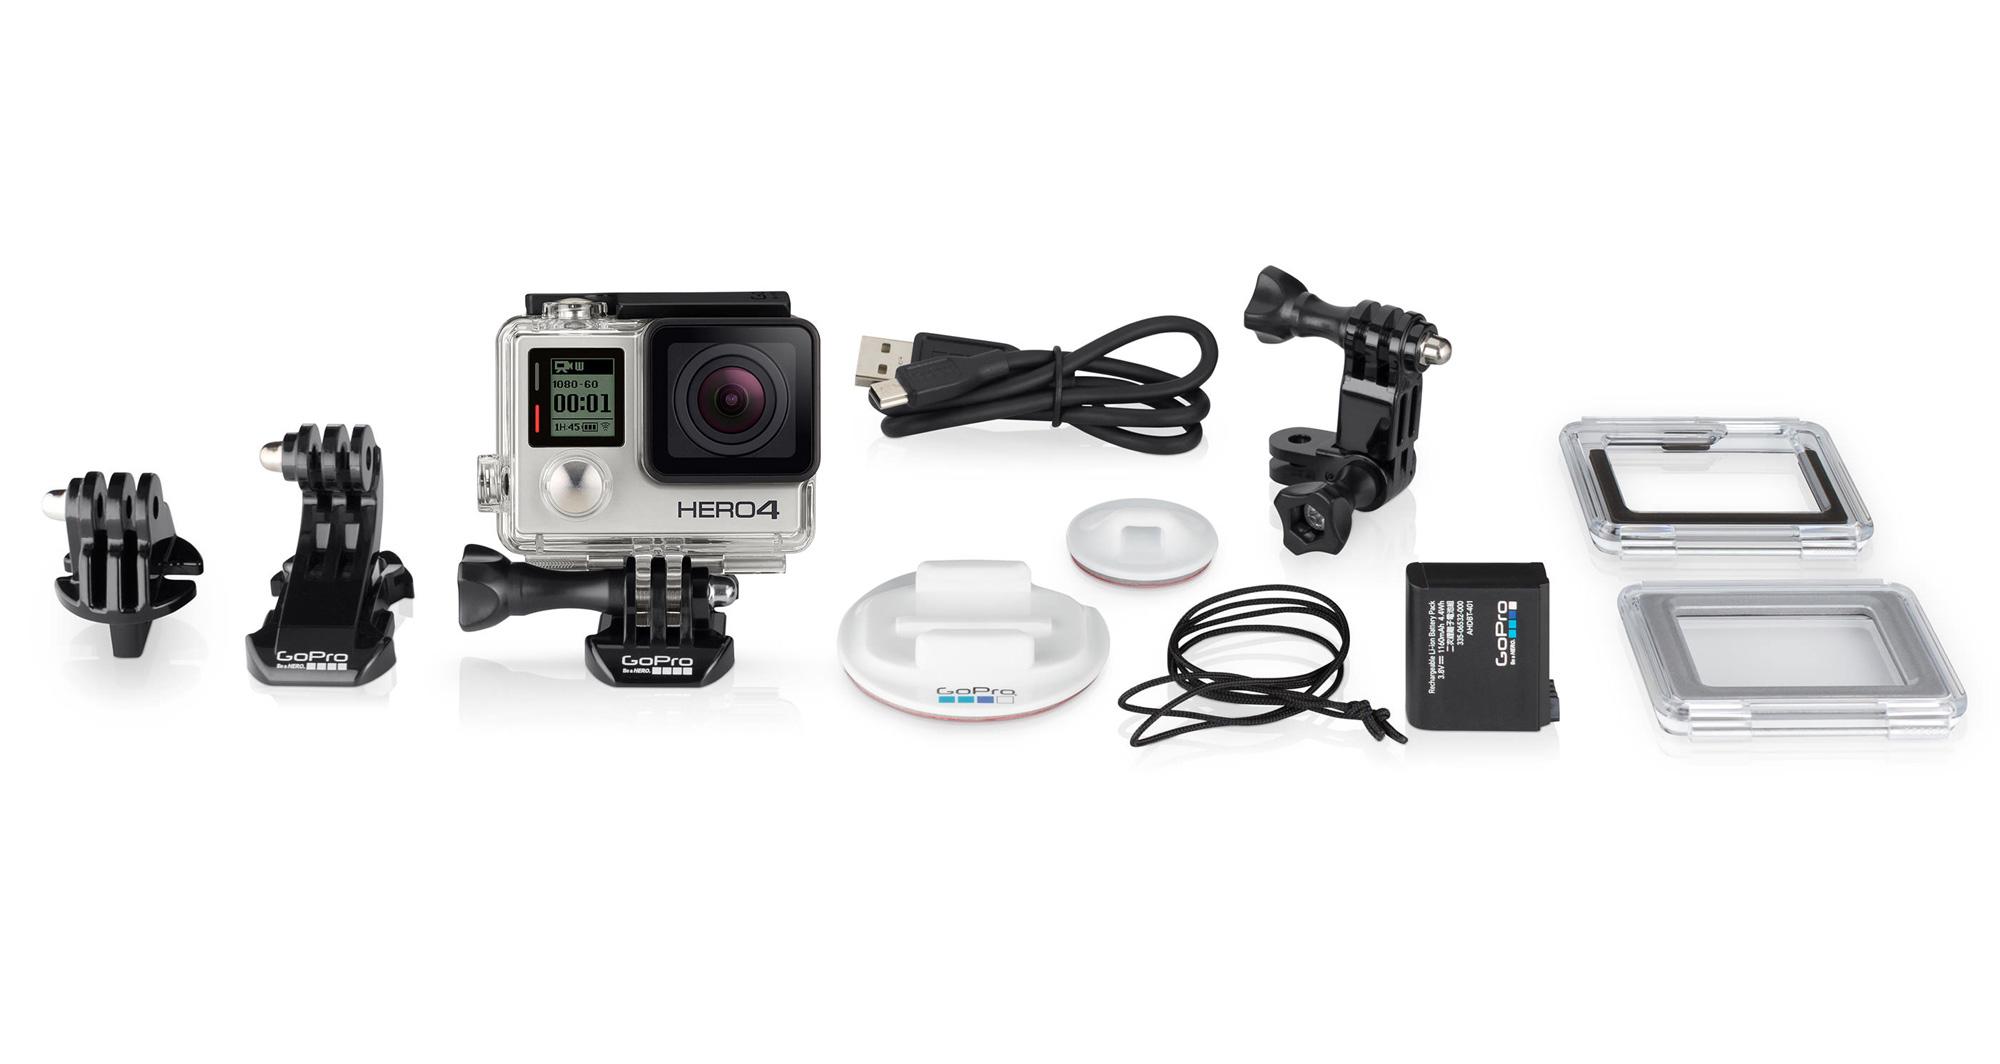 GoPro HERO4 Silver/Surf 4K HD POV Video Action Camera